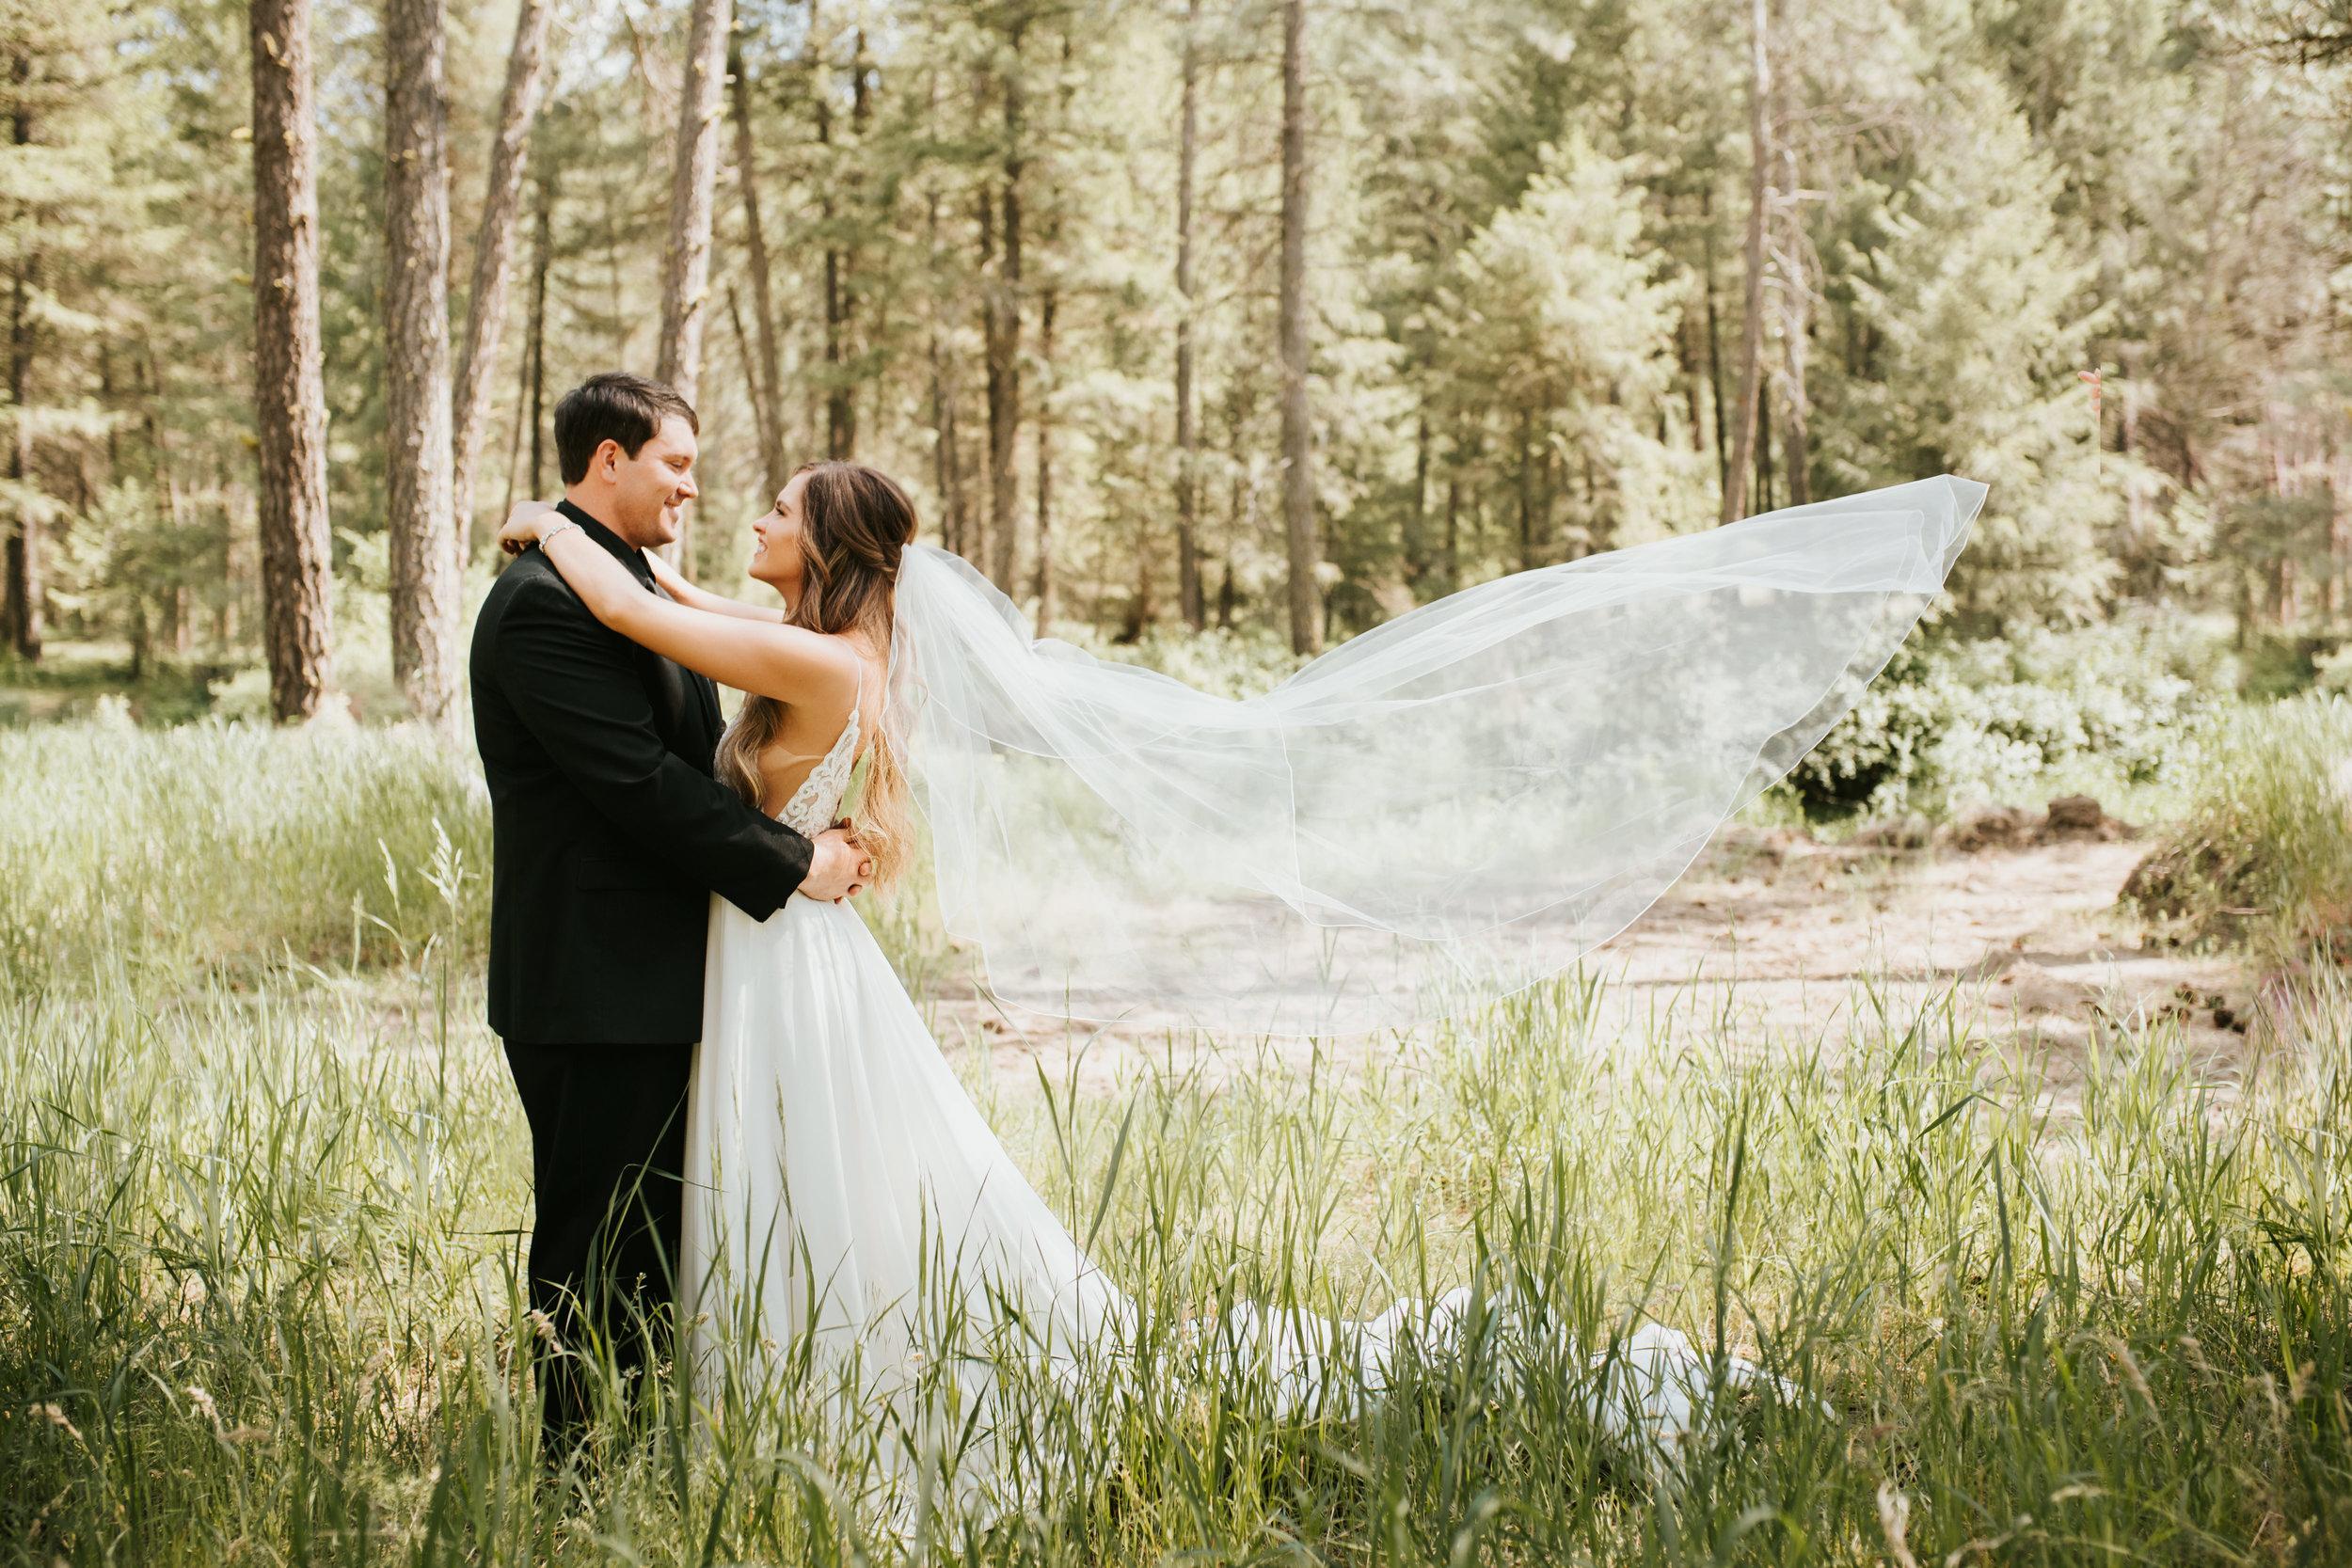 bride and groom long veil spokane wedding